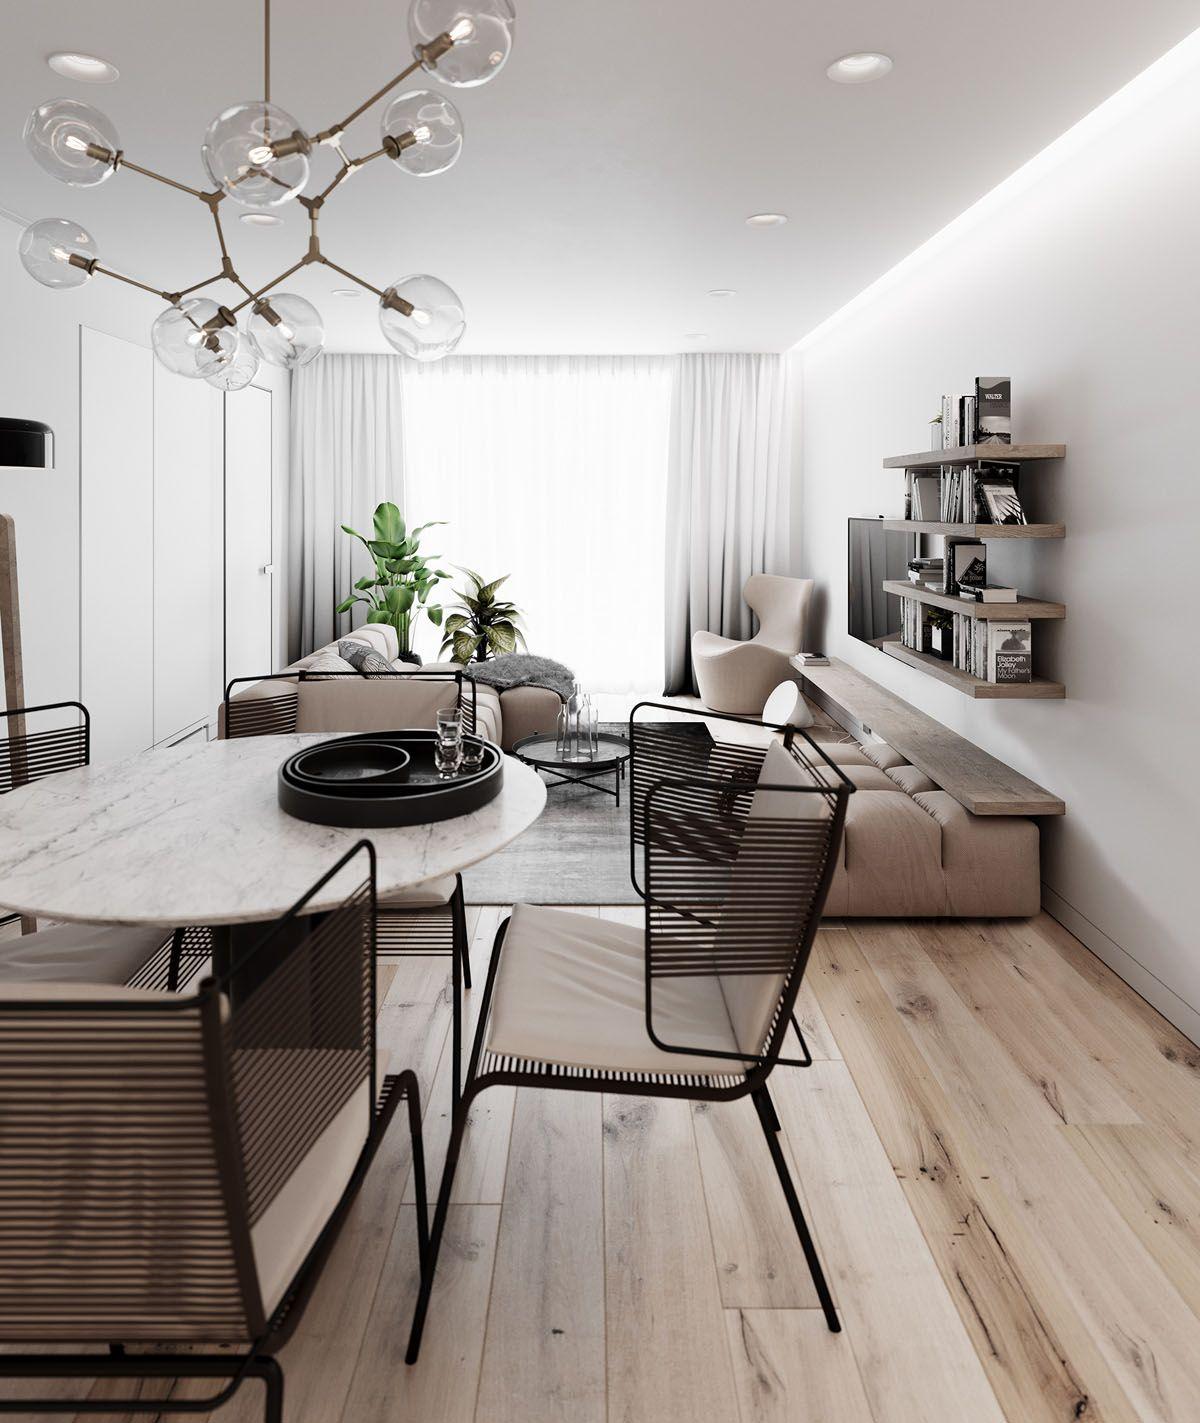 2 Simple Modern Homes With Simple Modern Furnishings Modern